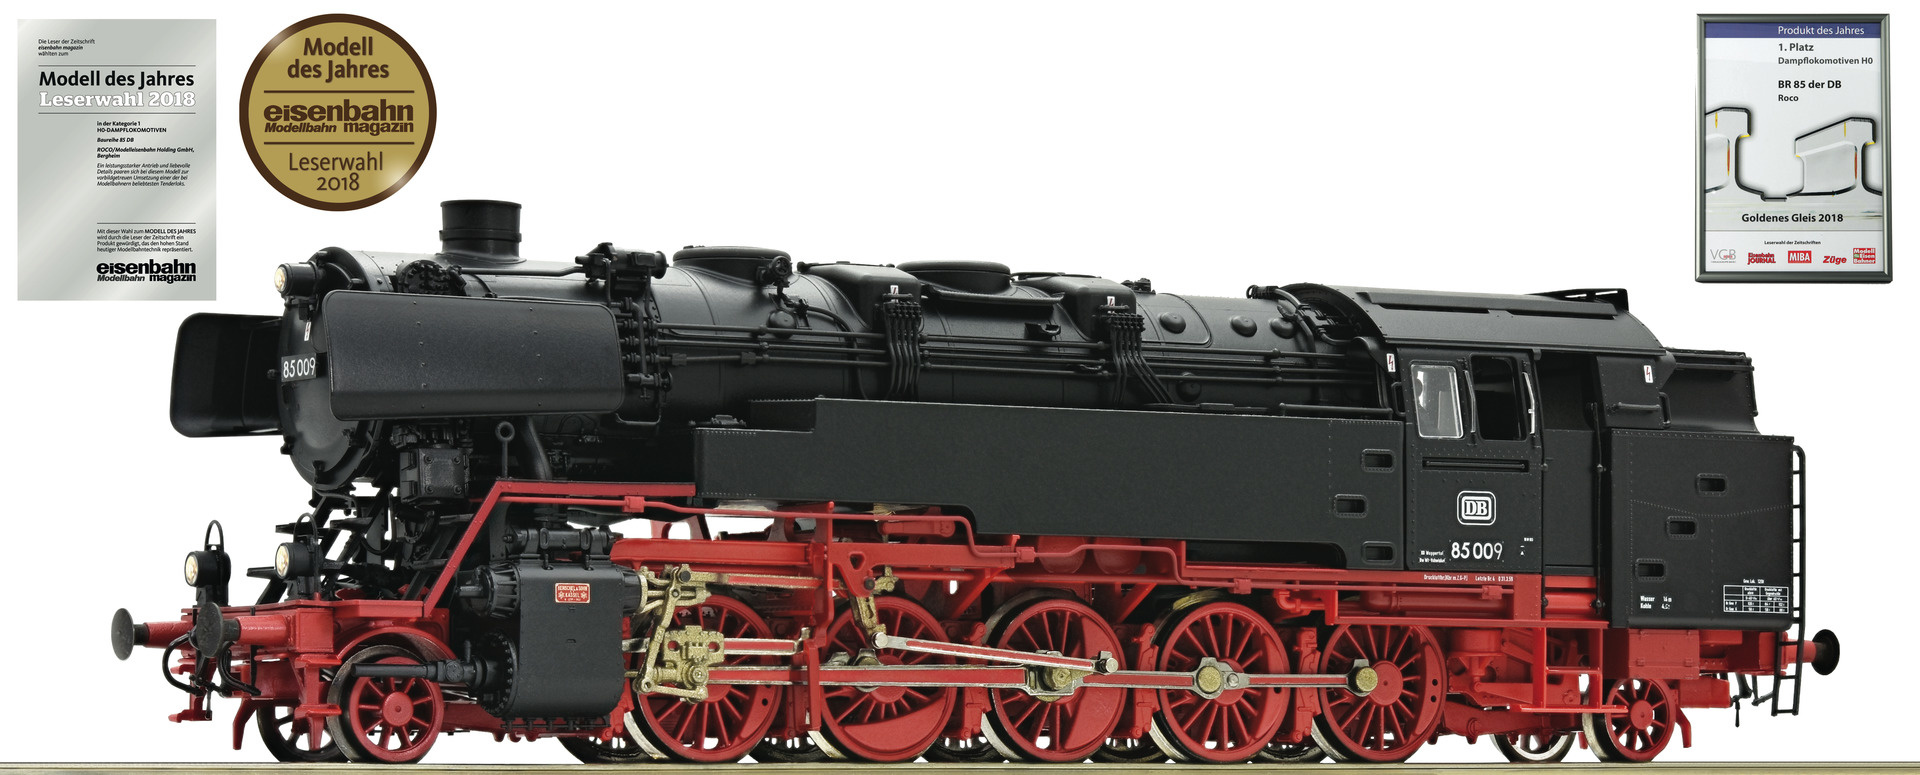 72272 Dampflok 85 009 DB-1